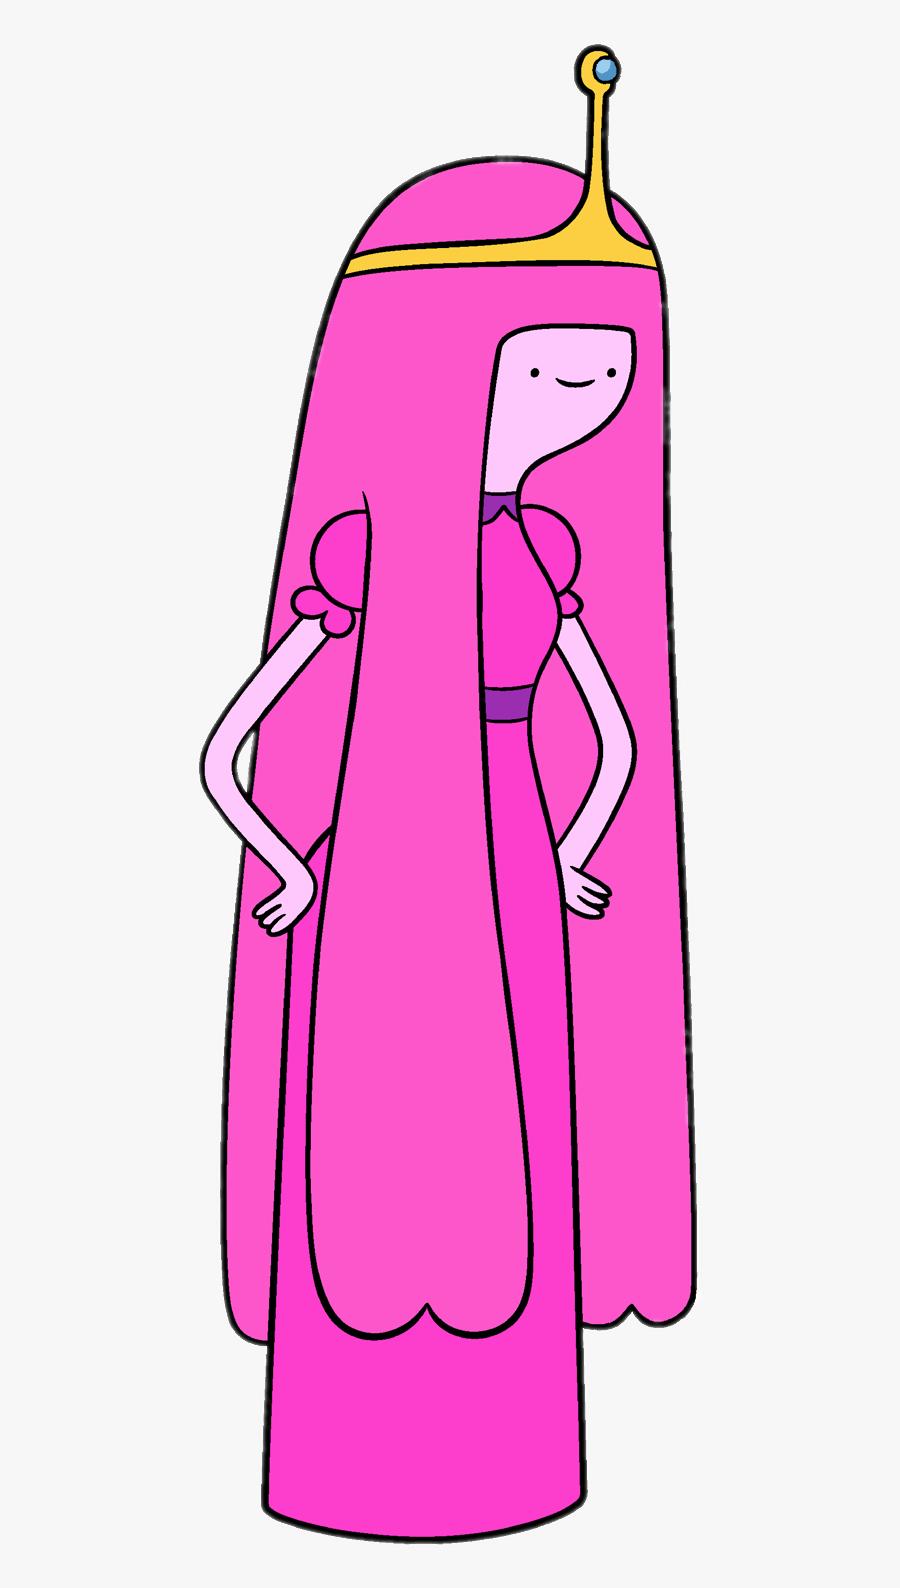 Adventure Time Princess Bubblegum Looking Down - Adventure Time Princess Bubblegum Png, Transparent Clipart